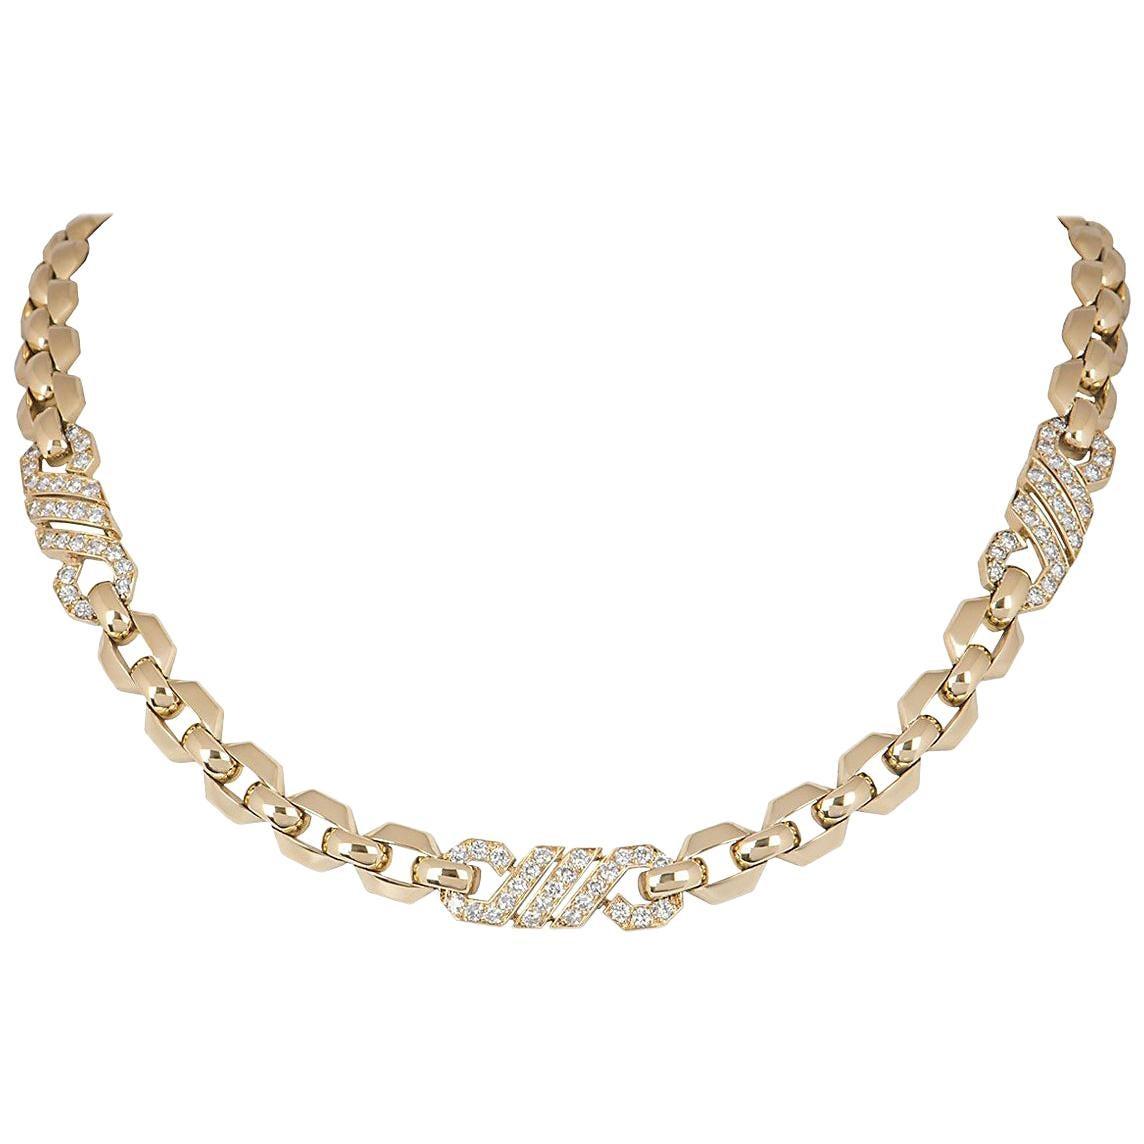 Cartier Diamond Yellow Gold Link Choker Necklace 3.00 Carat